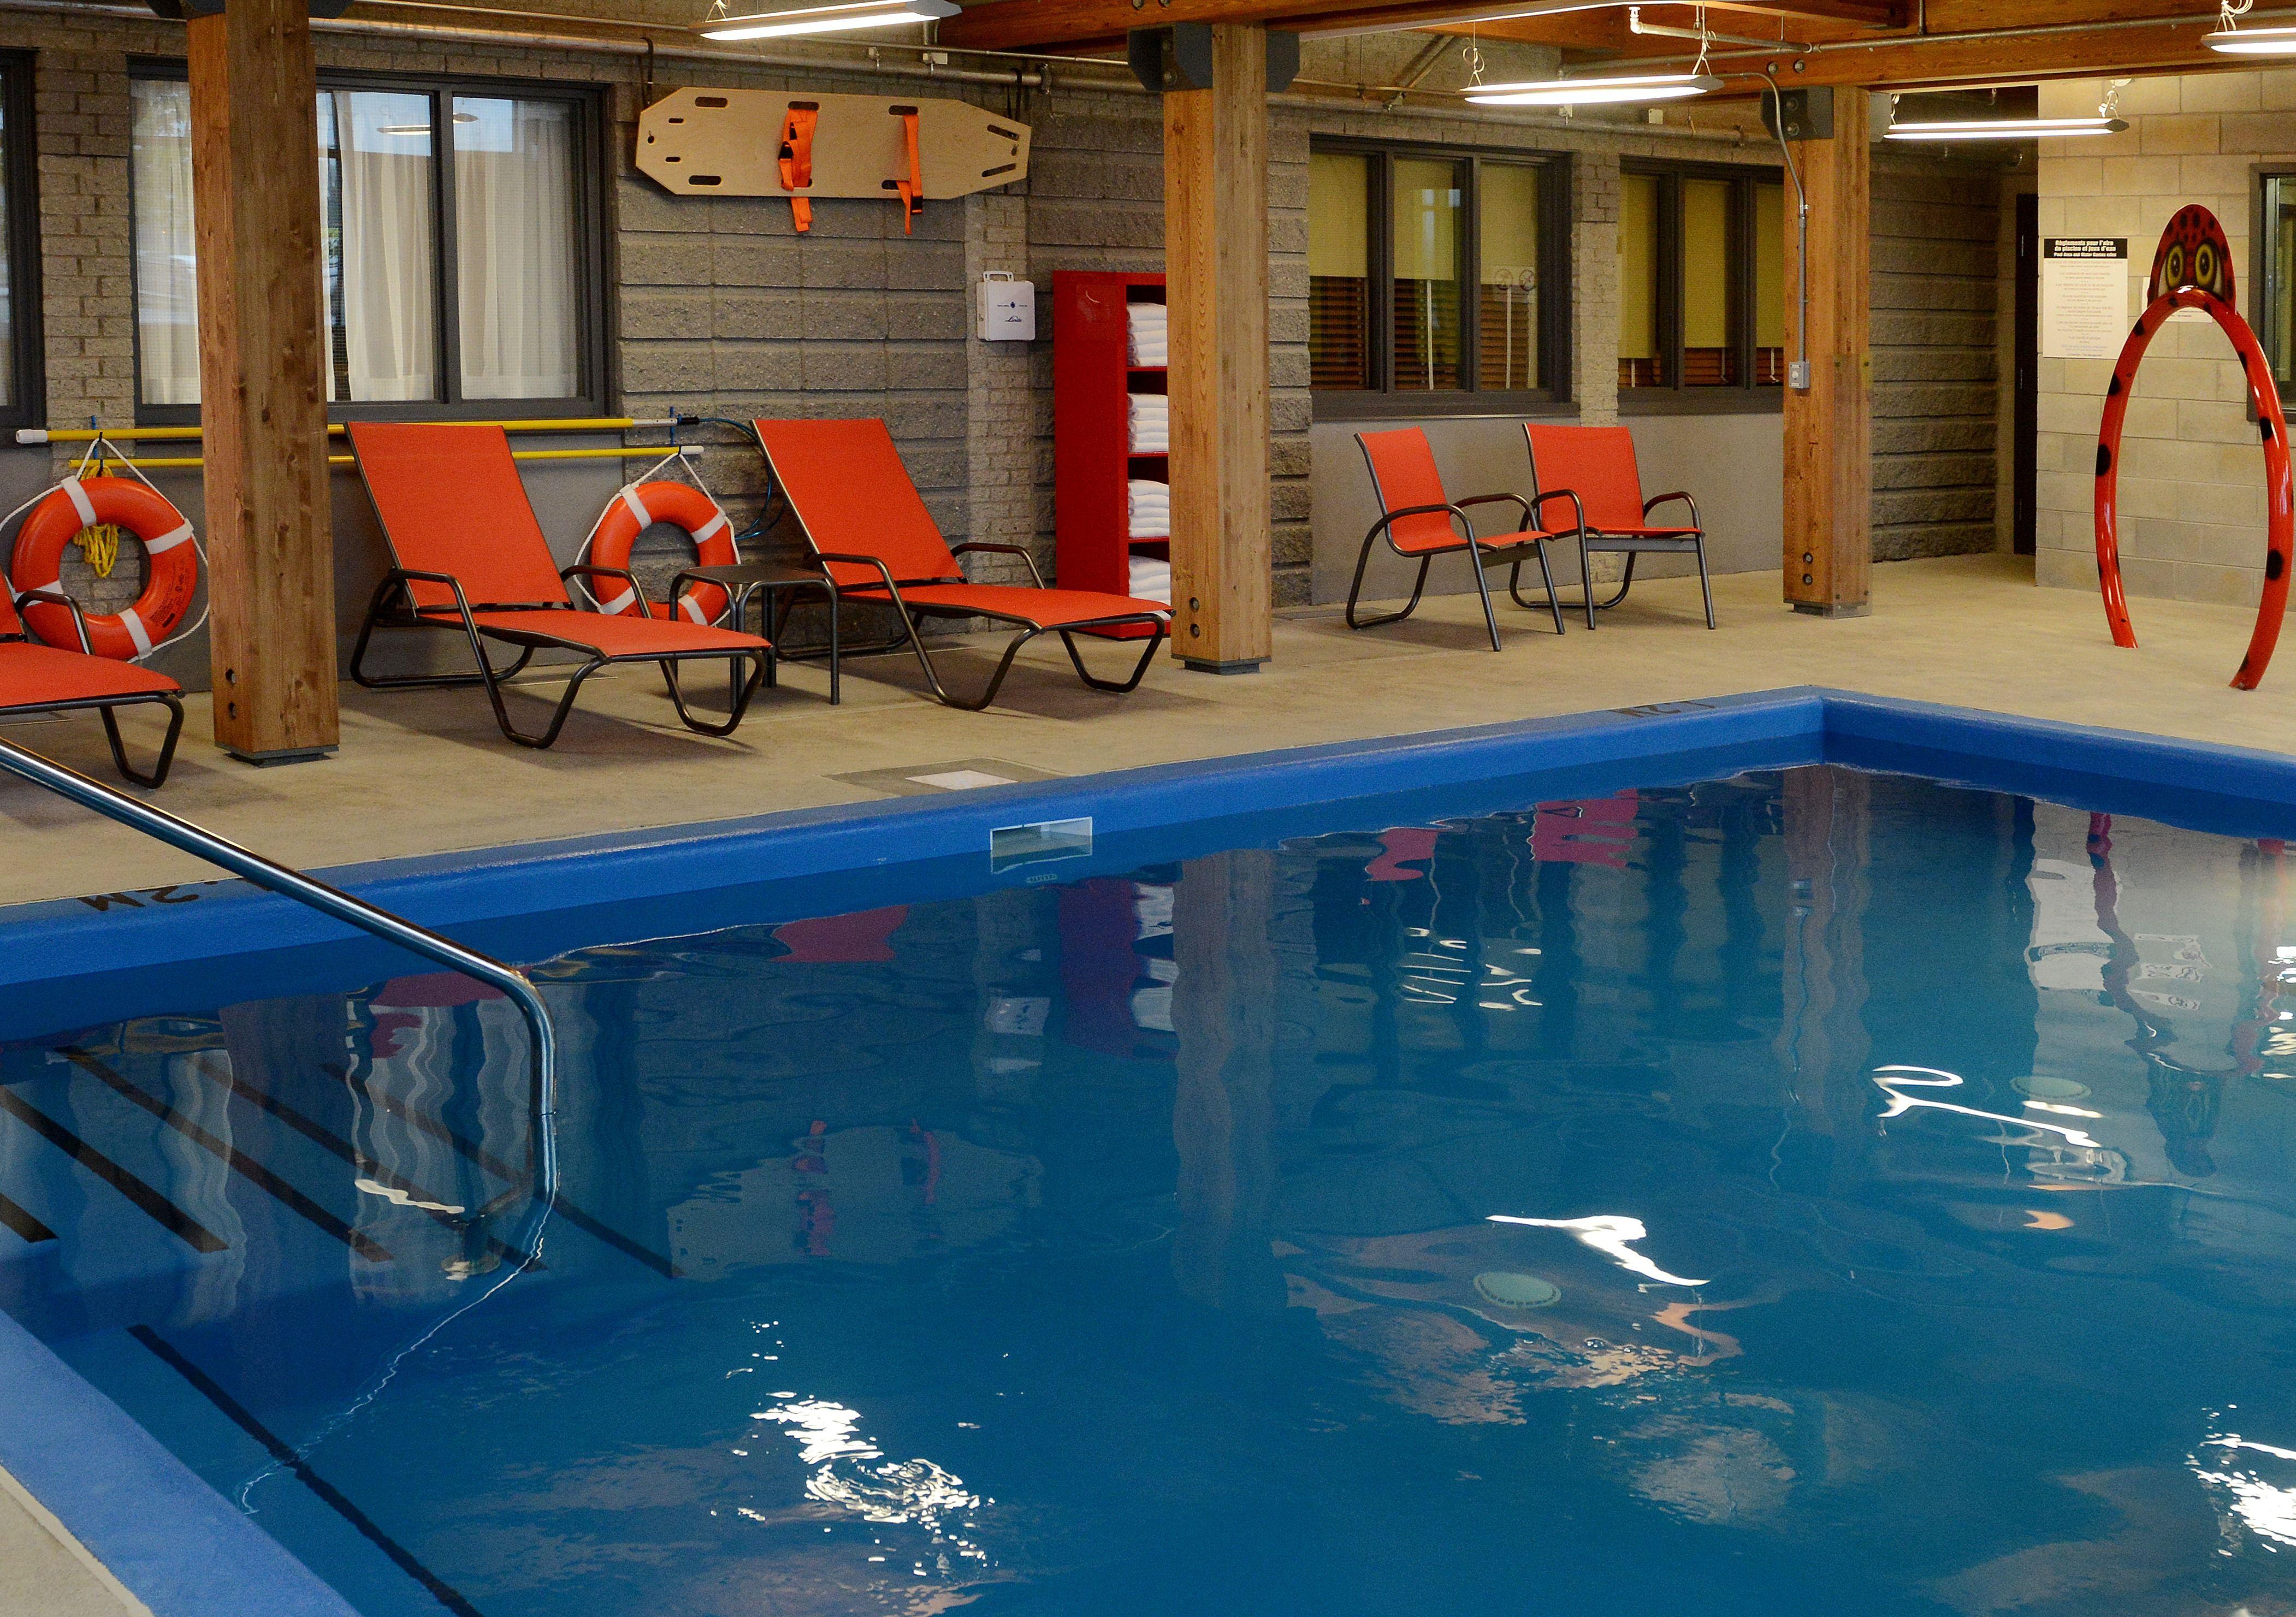 htel avec piscine intrieure et petit djeuner inclus